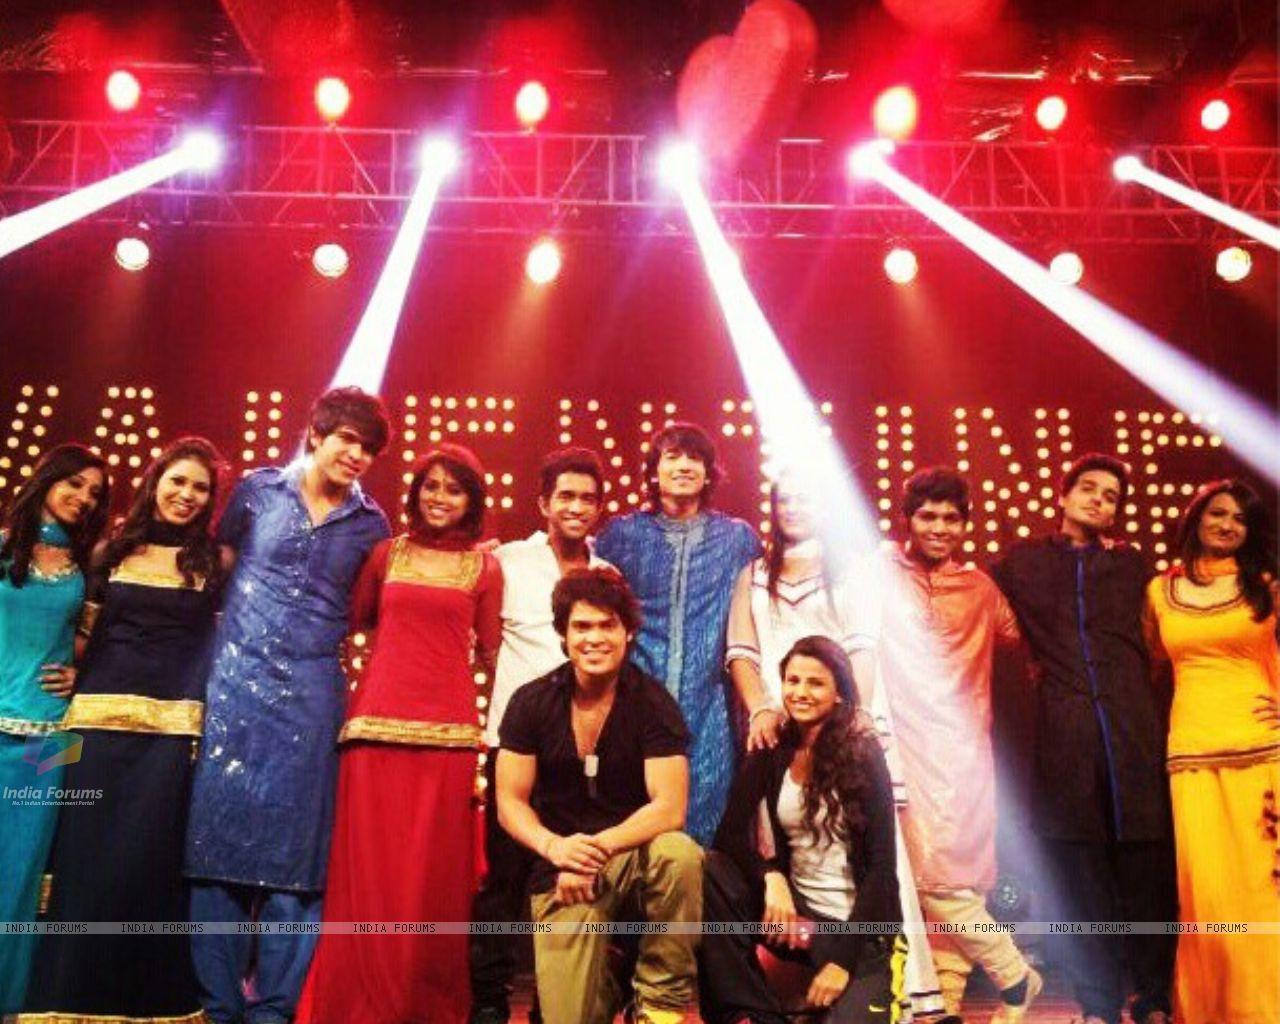 Dil Dosti Dance Team   Wallpaper Size1280x1024 1280x1024